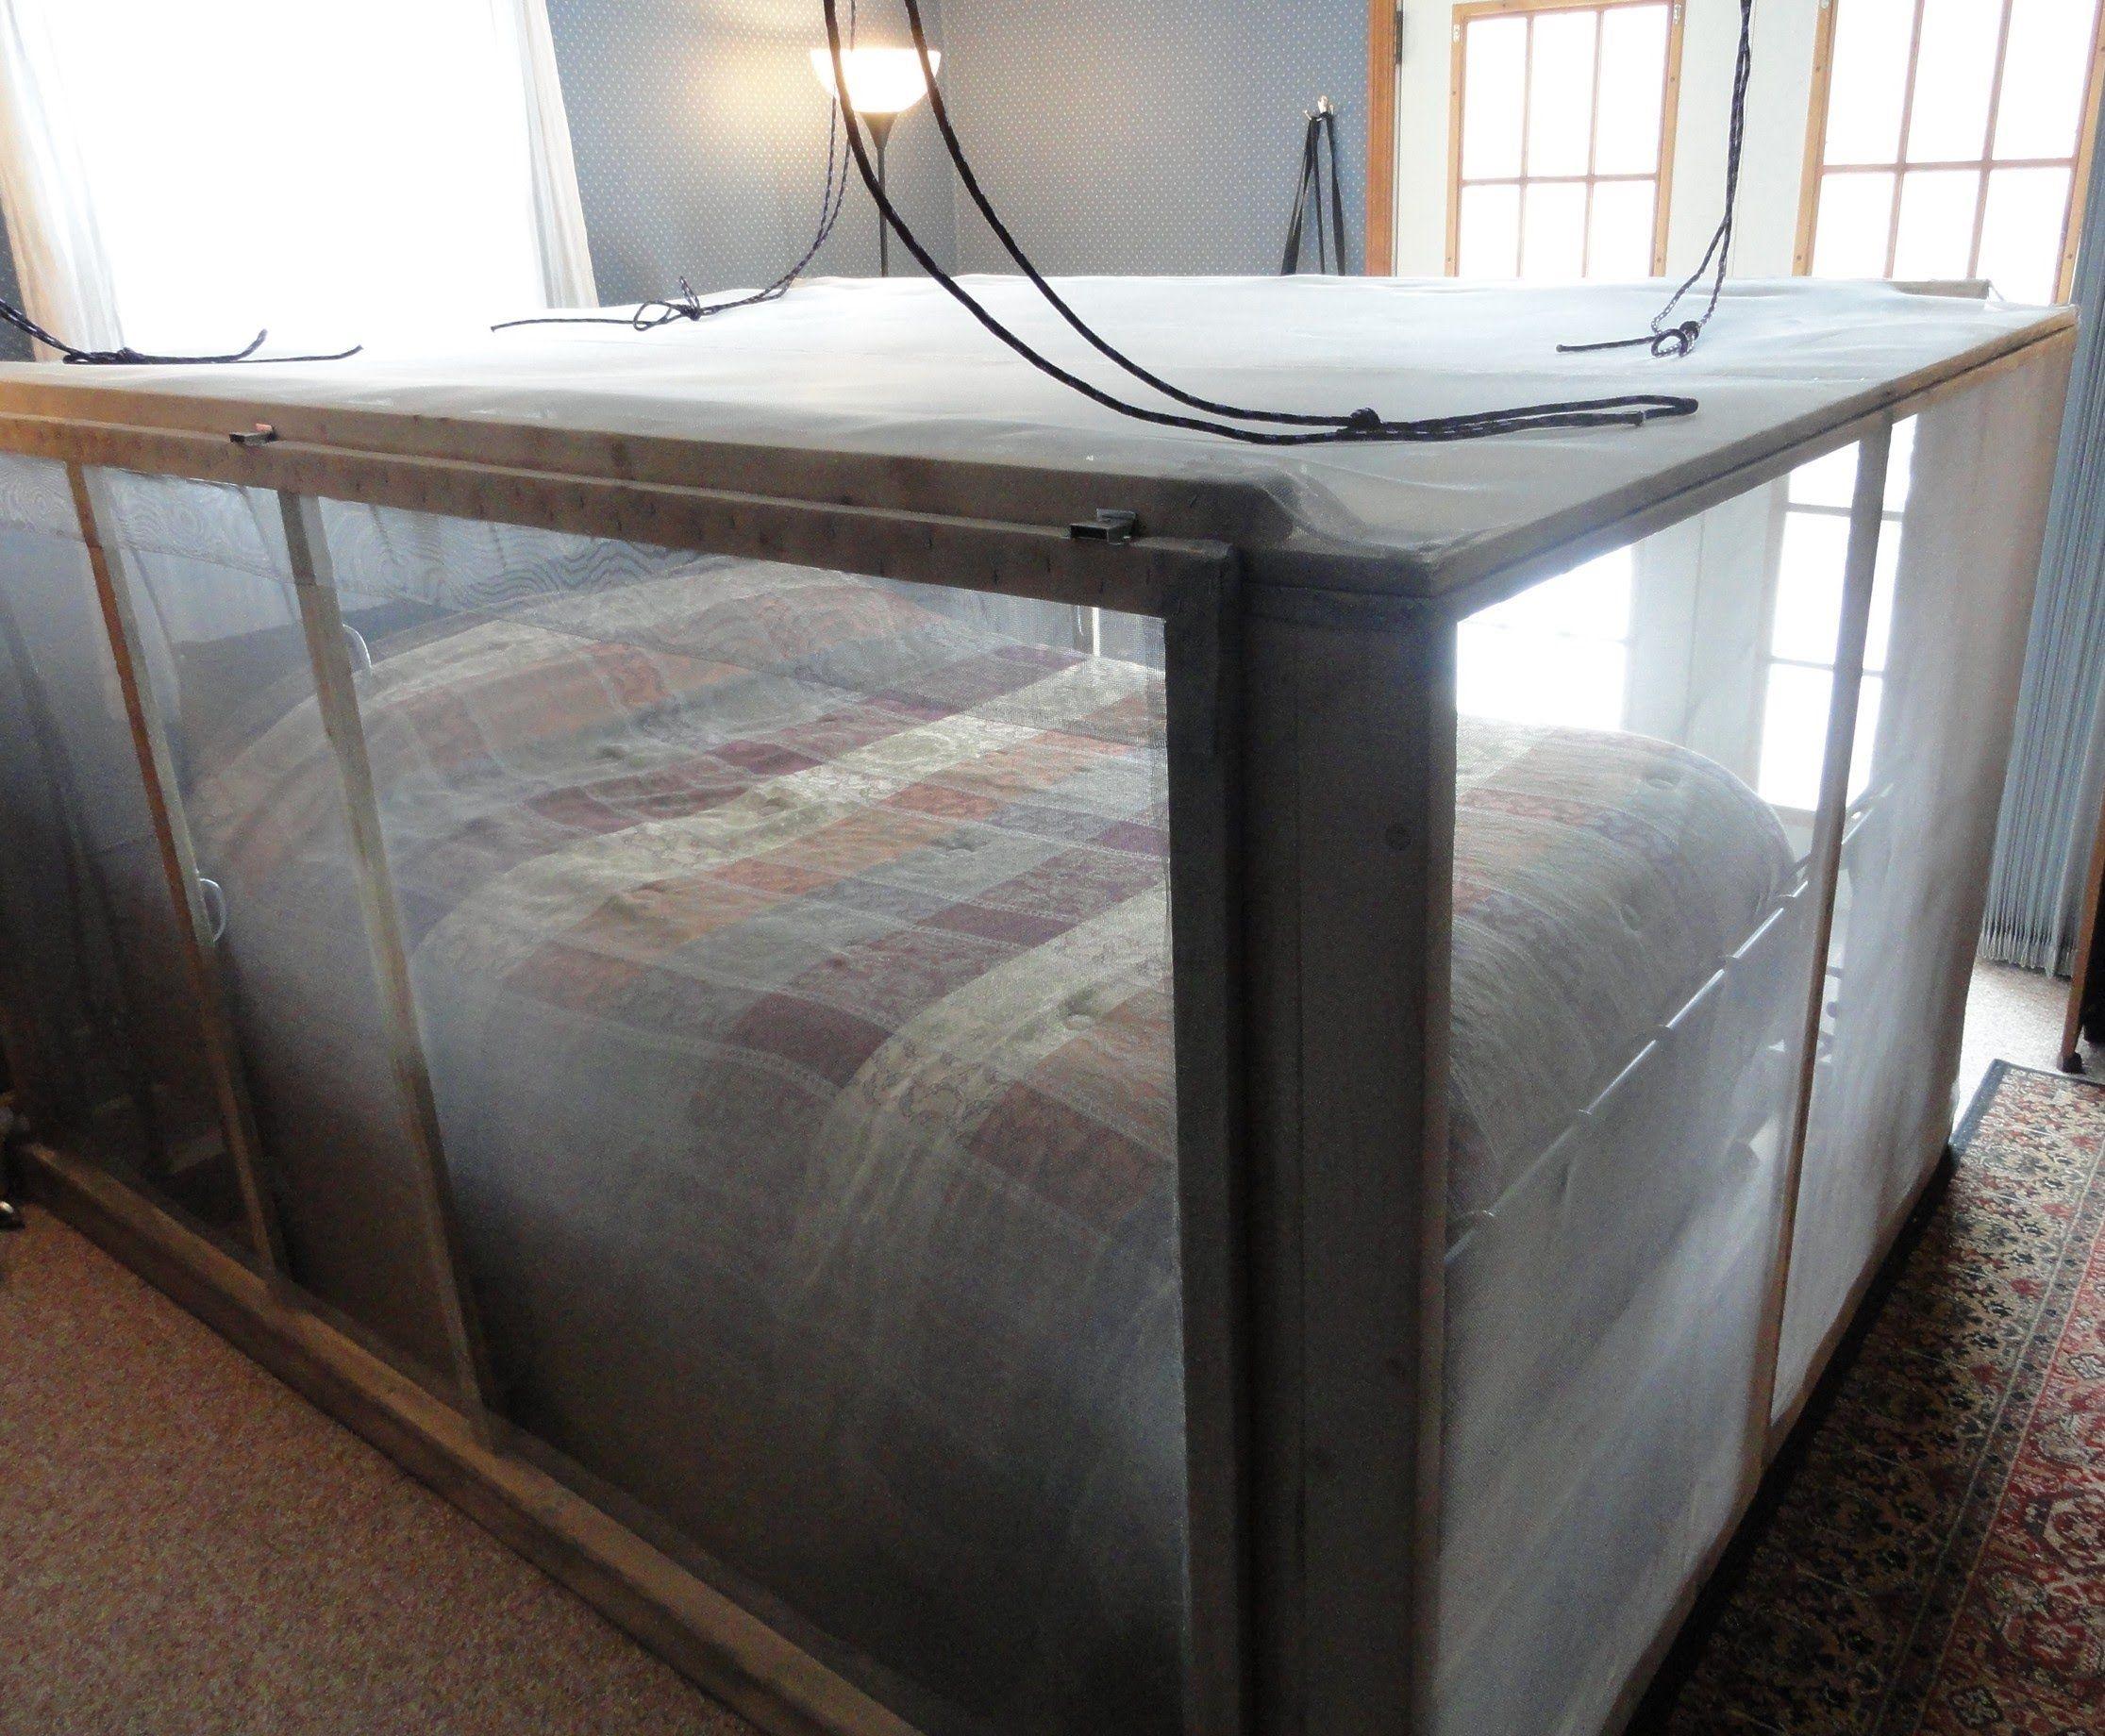 Sleep Inside A Faraday Cage Diy Bed Survival Cage